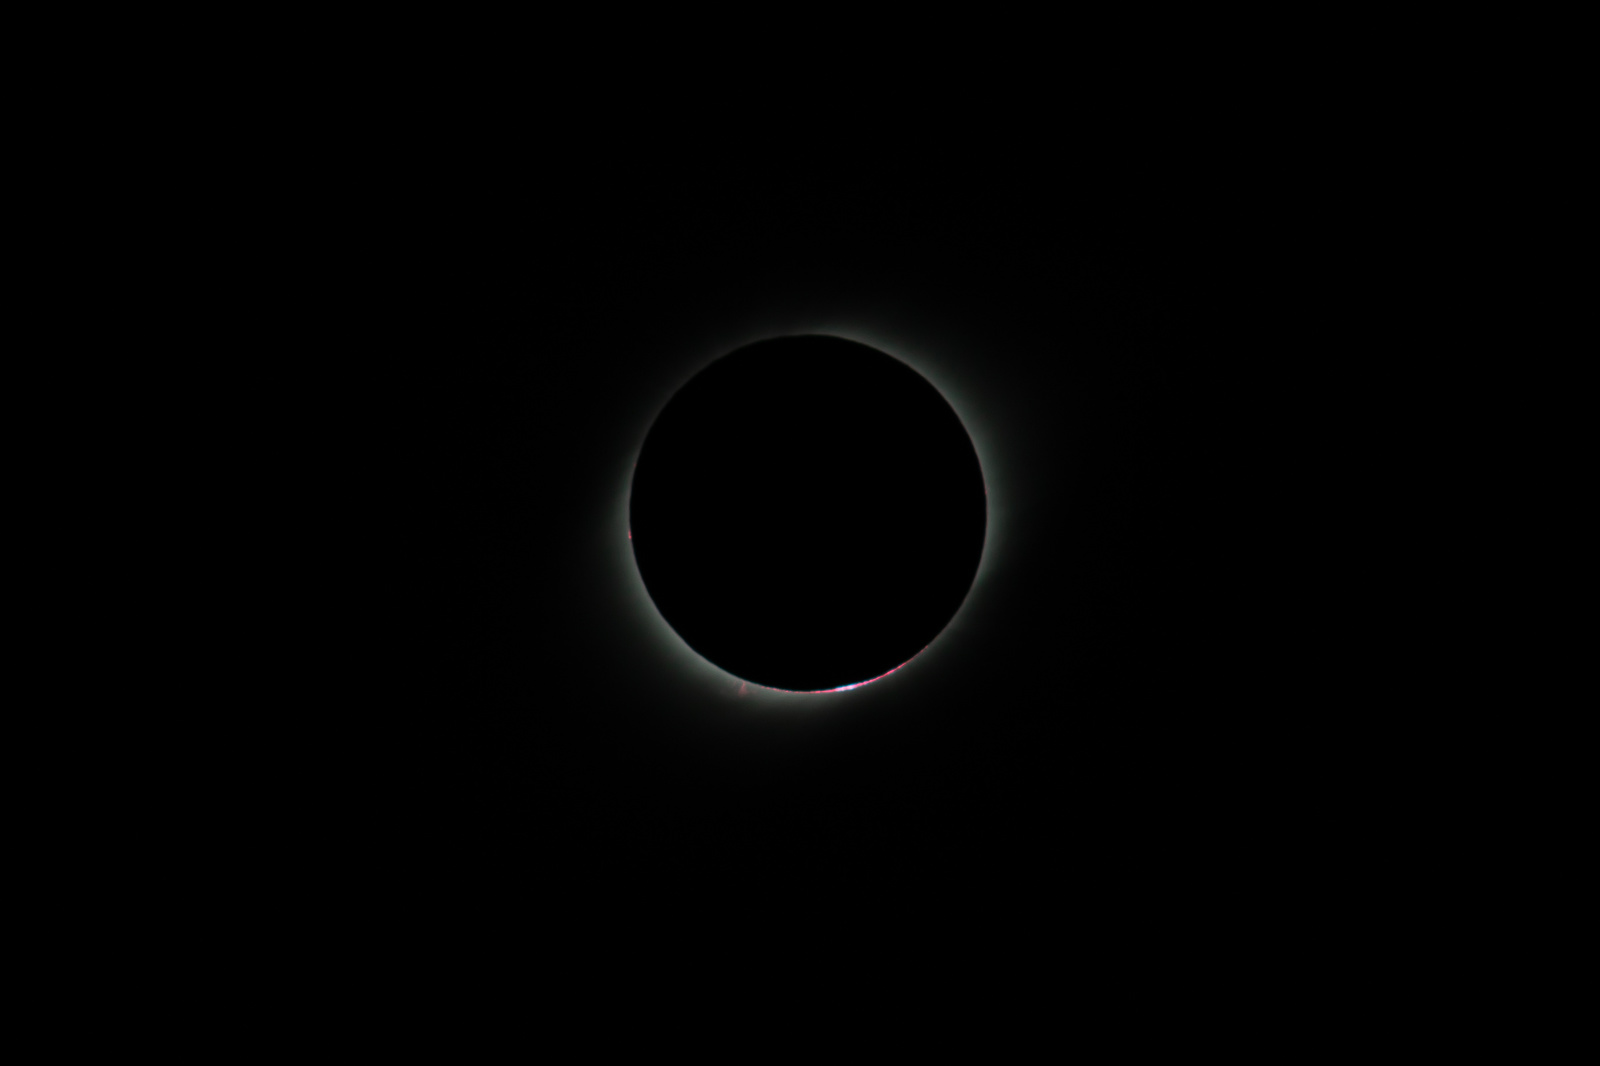 _MGL8555-prominences.thumb.jpg.26cee6268877a92afce7f3cf3f8dfed5.jpg